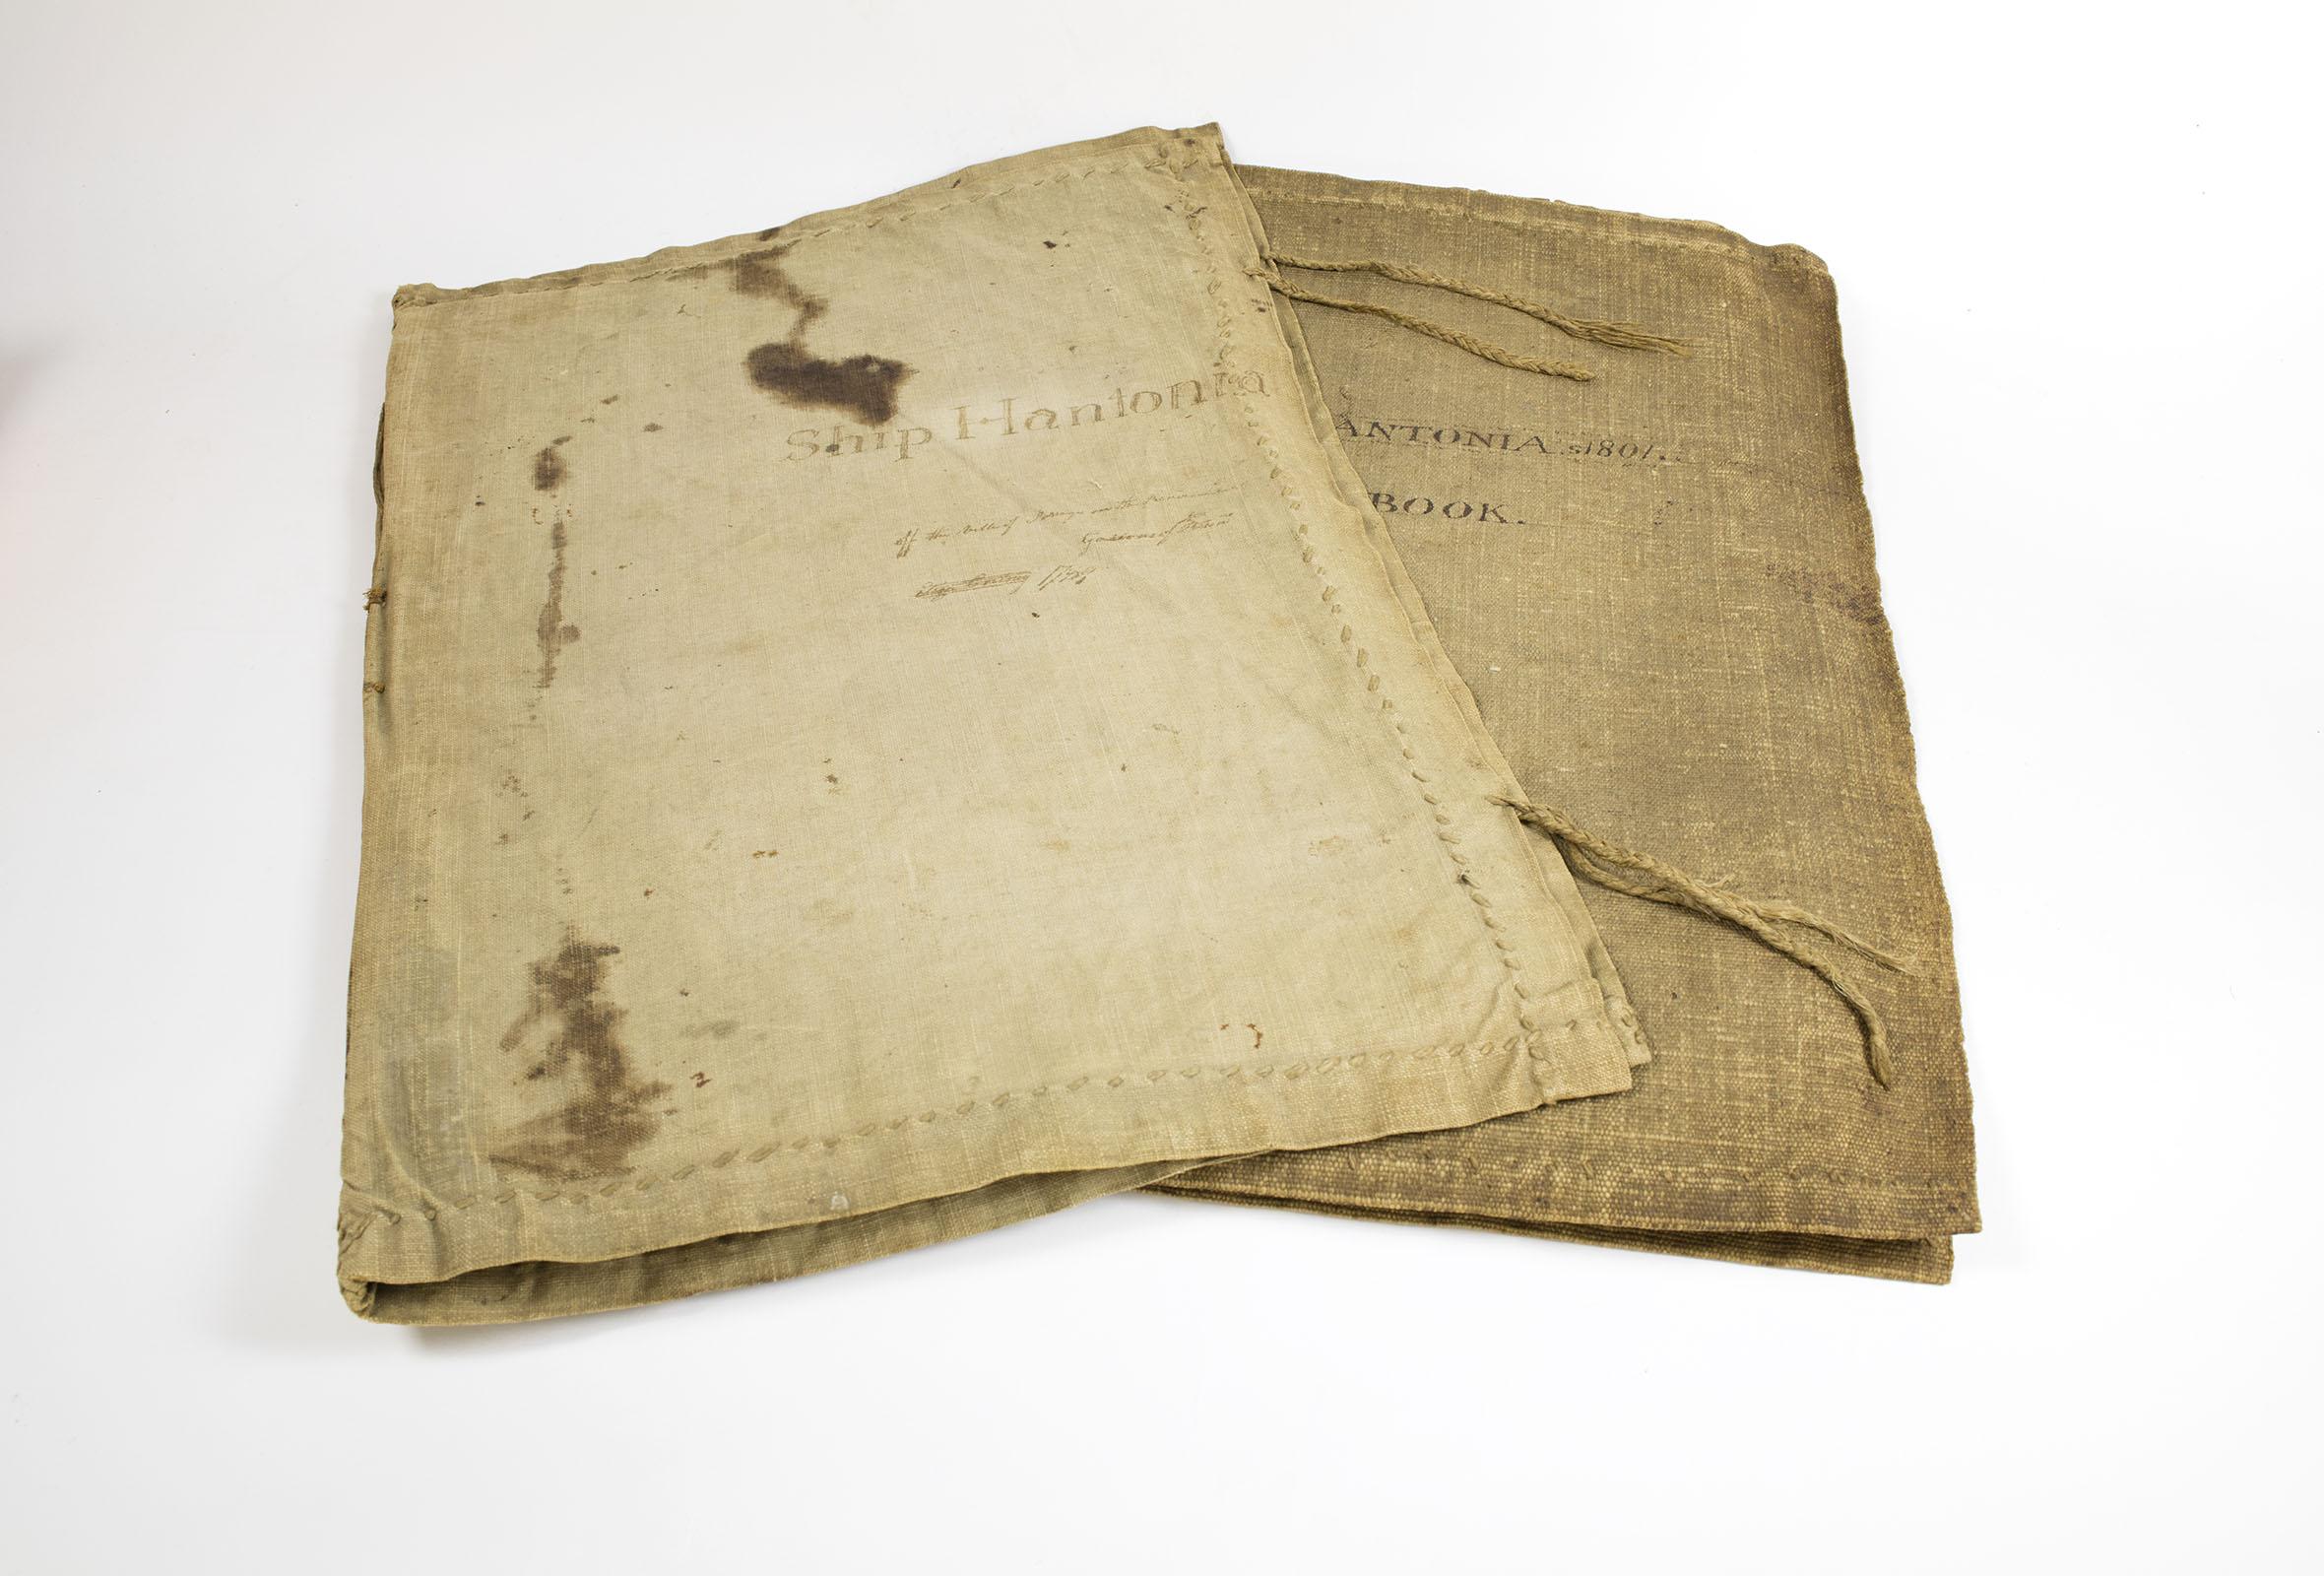 Ships' log for Hantonia II (constructed in 1811). Michael Zinman Binding Collection.